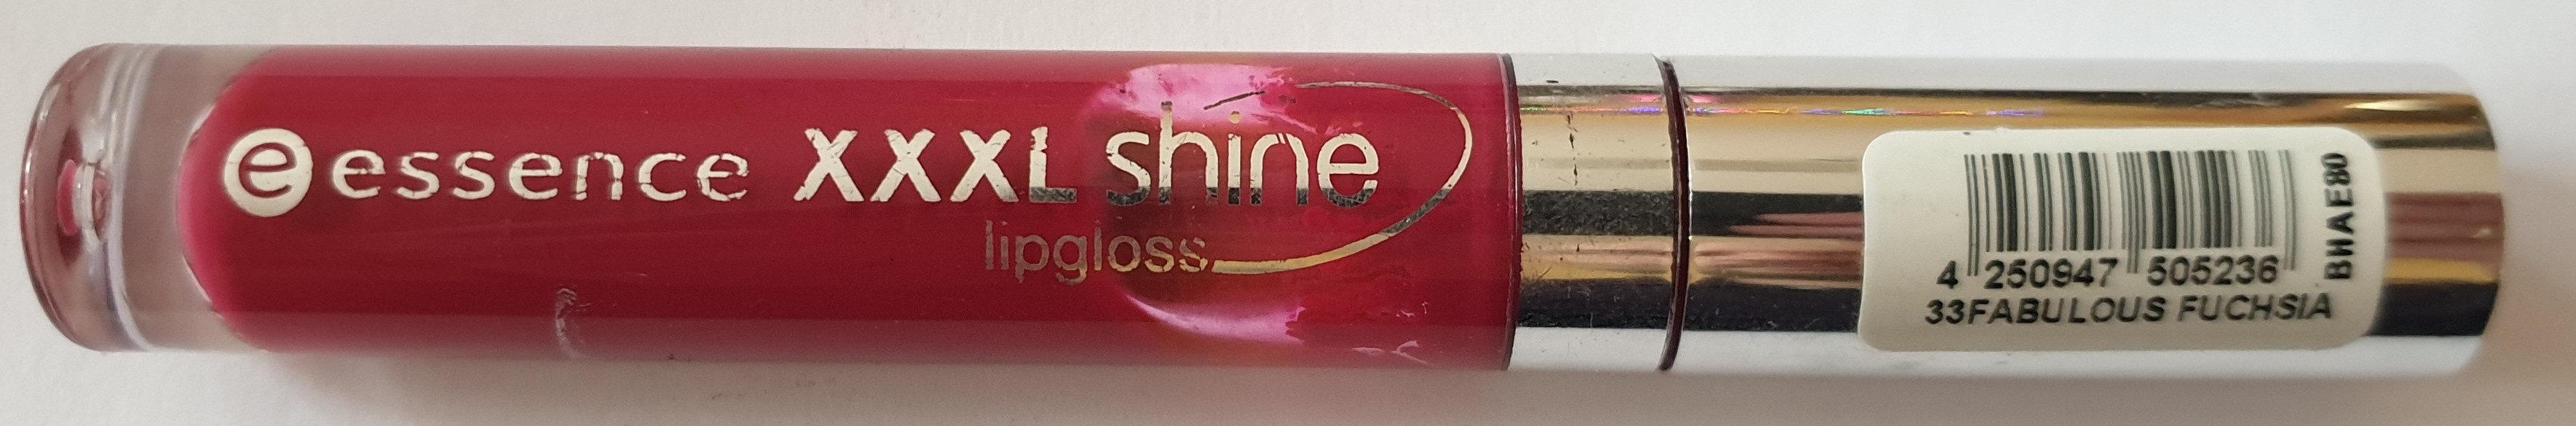 XXXL shine 33 fabulous fuchsia - Produit - de